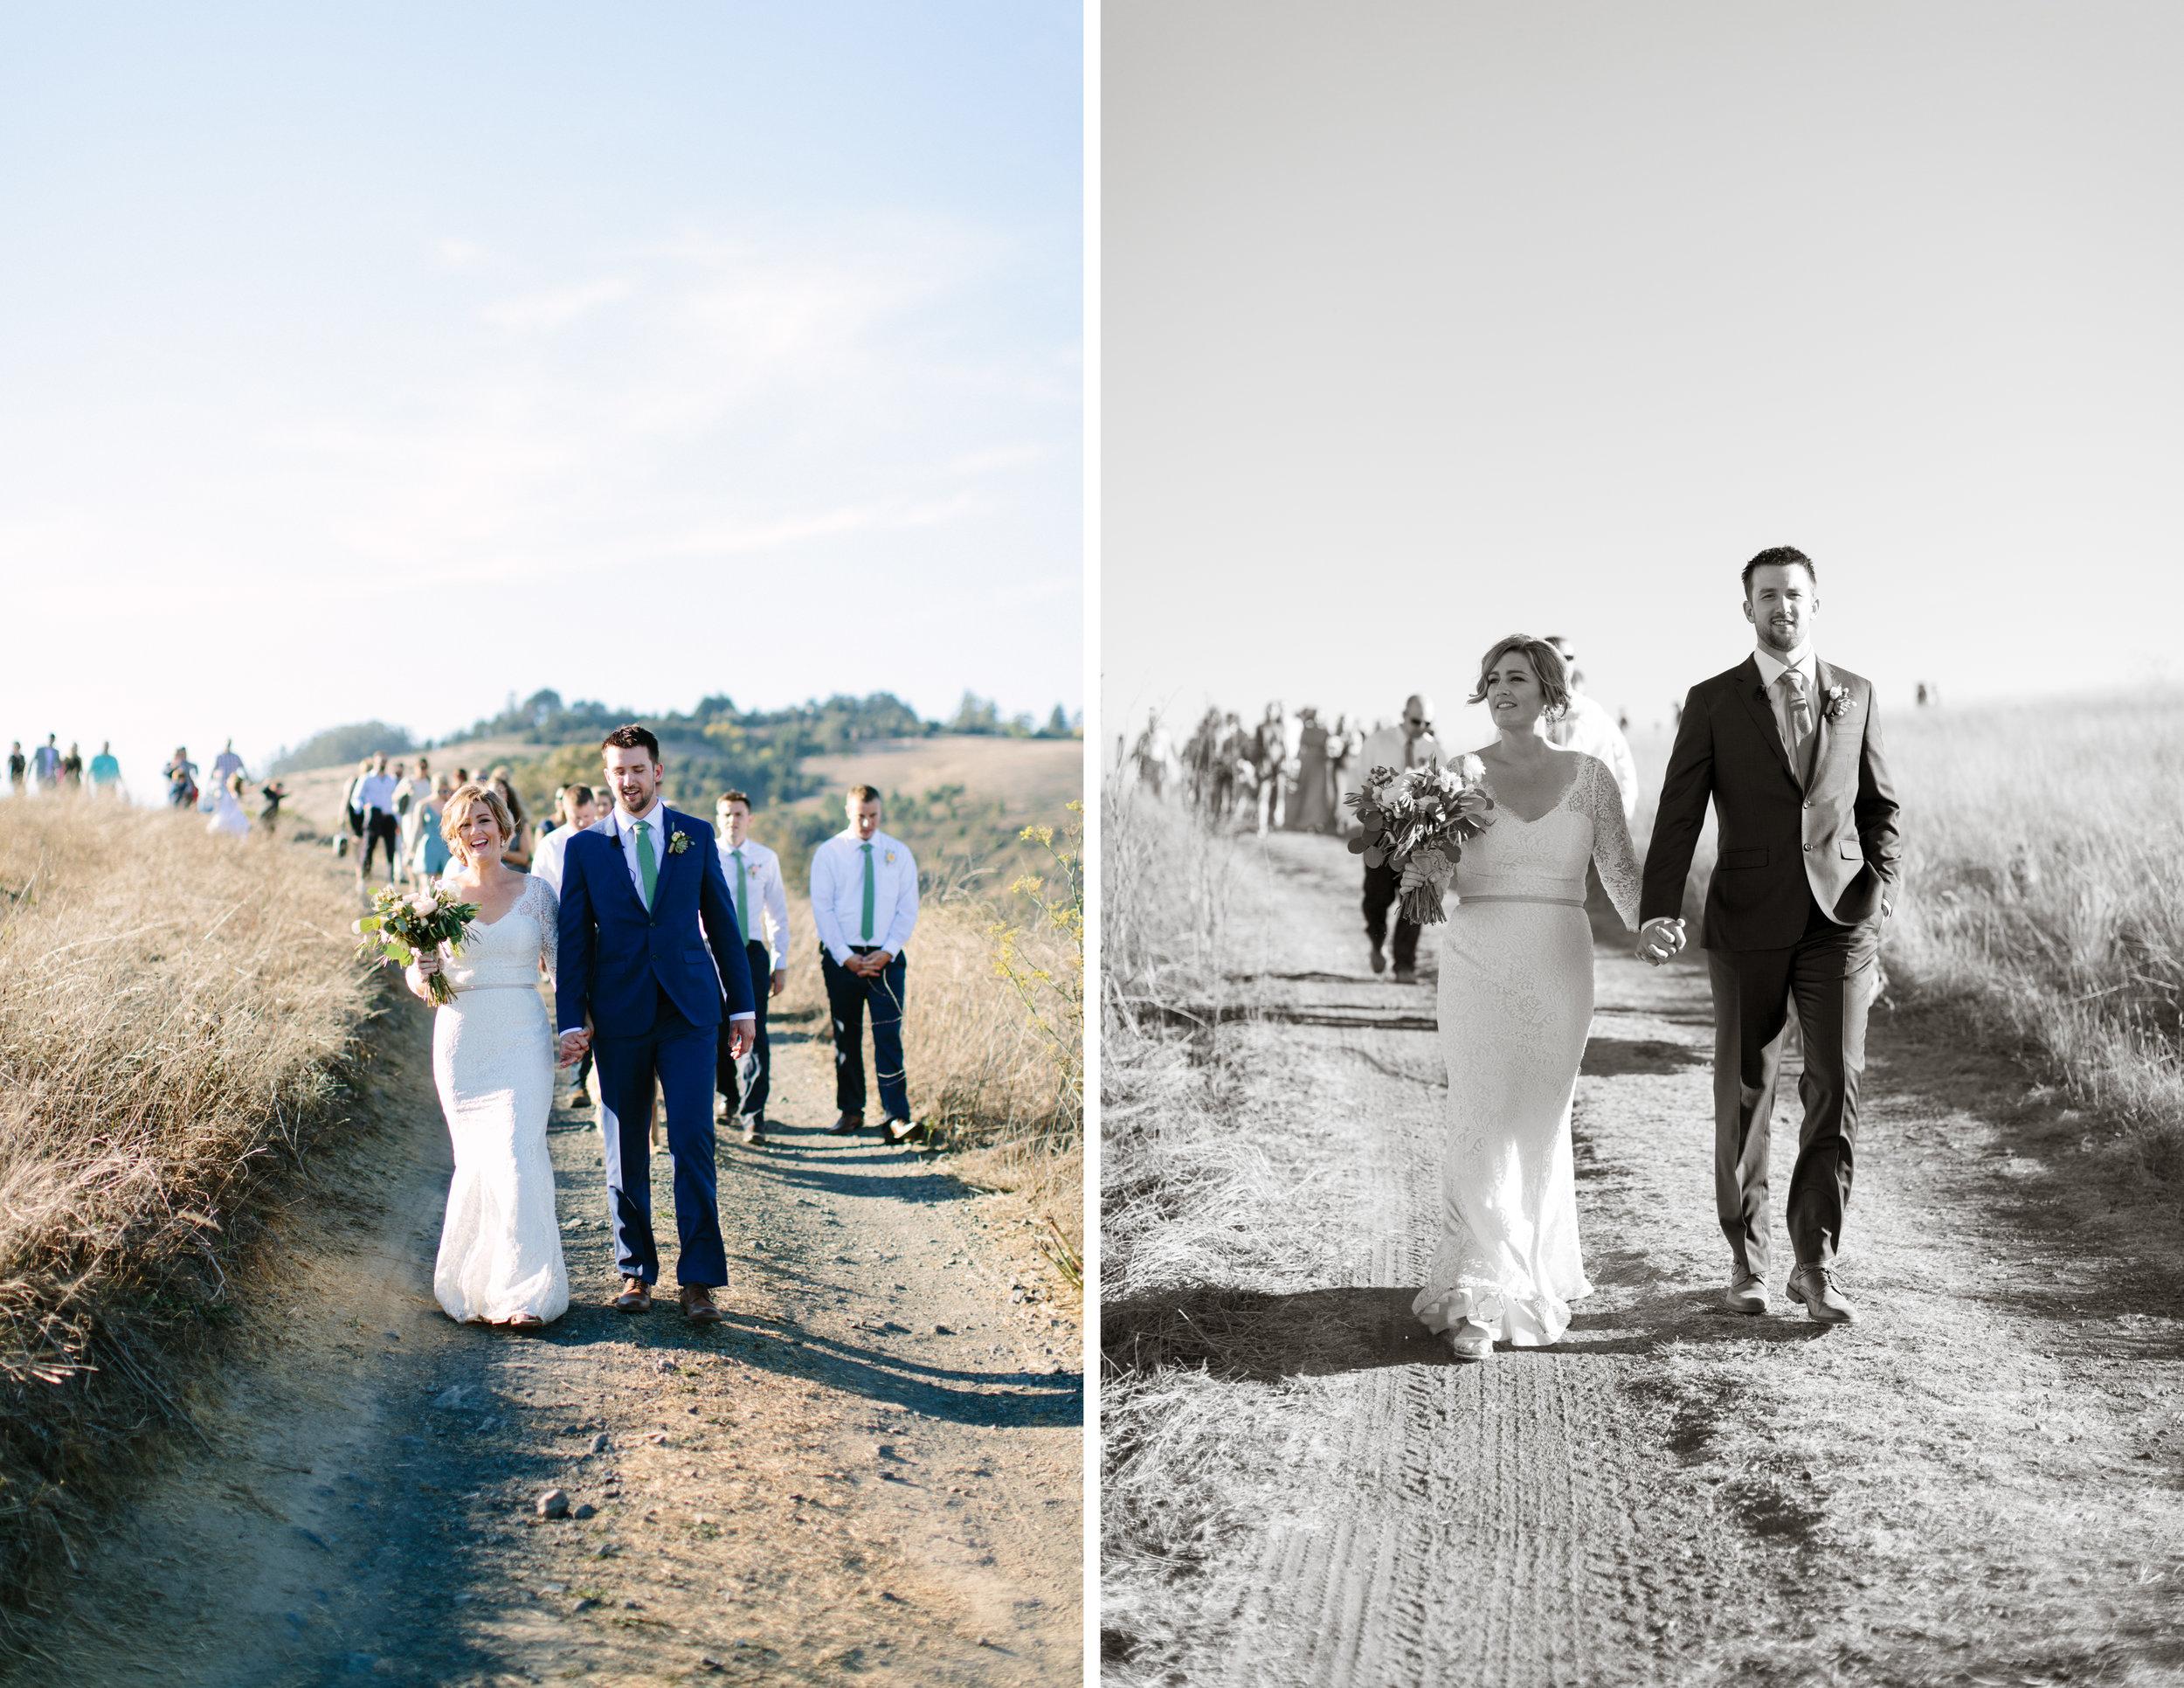 bloomfield farms wedding 6.jpg